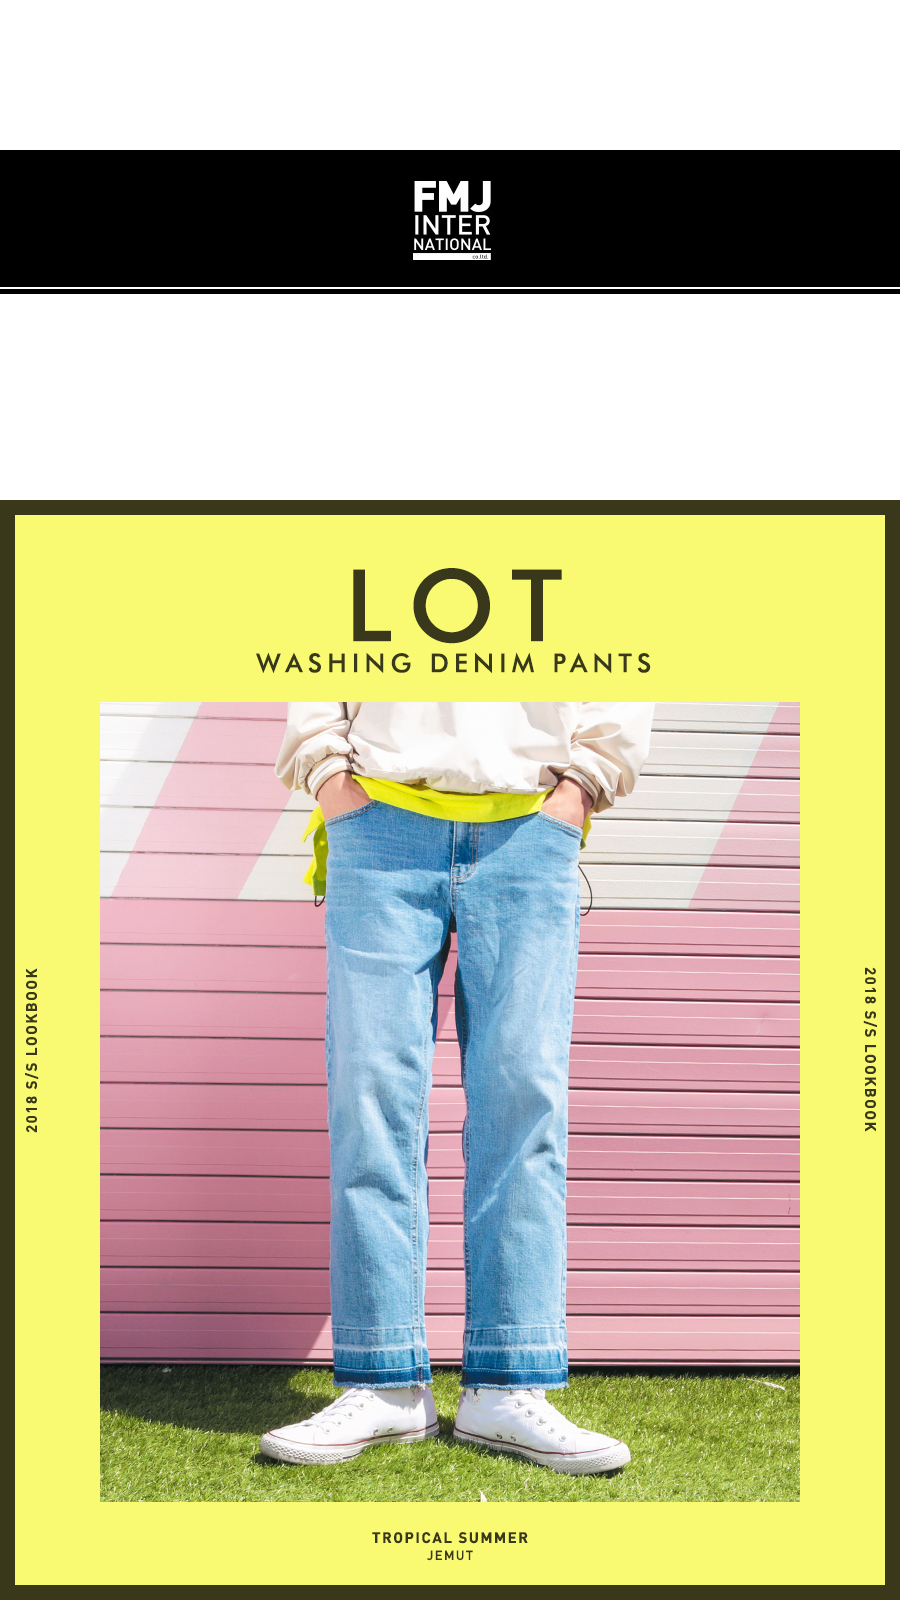 20180514_lot_washing_denim_pants_model_kj_01.jpg